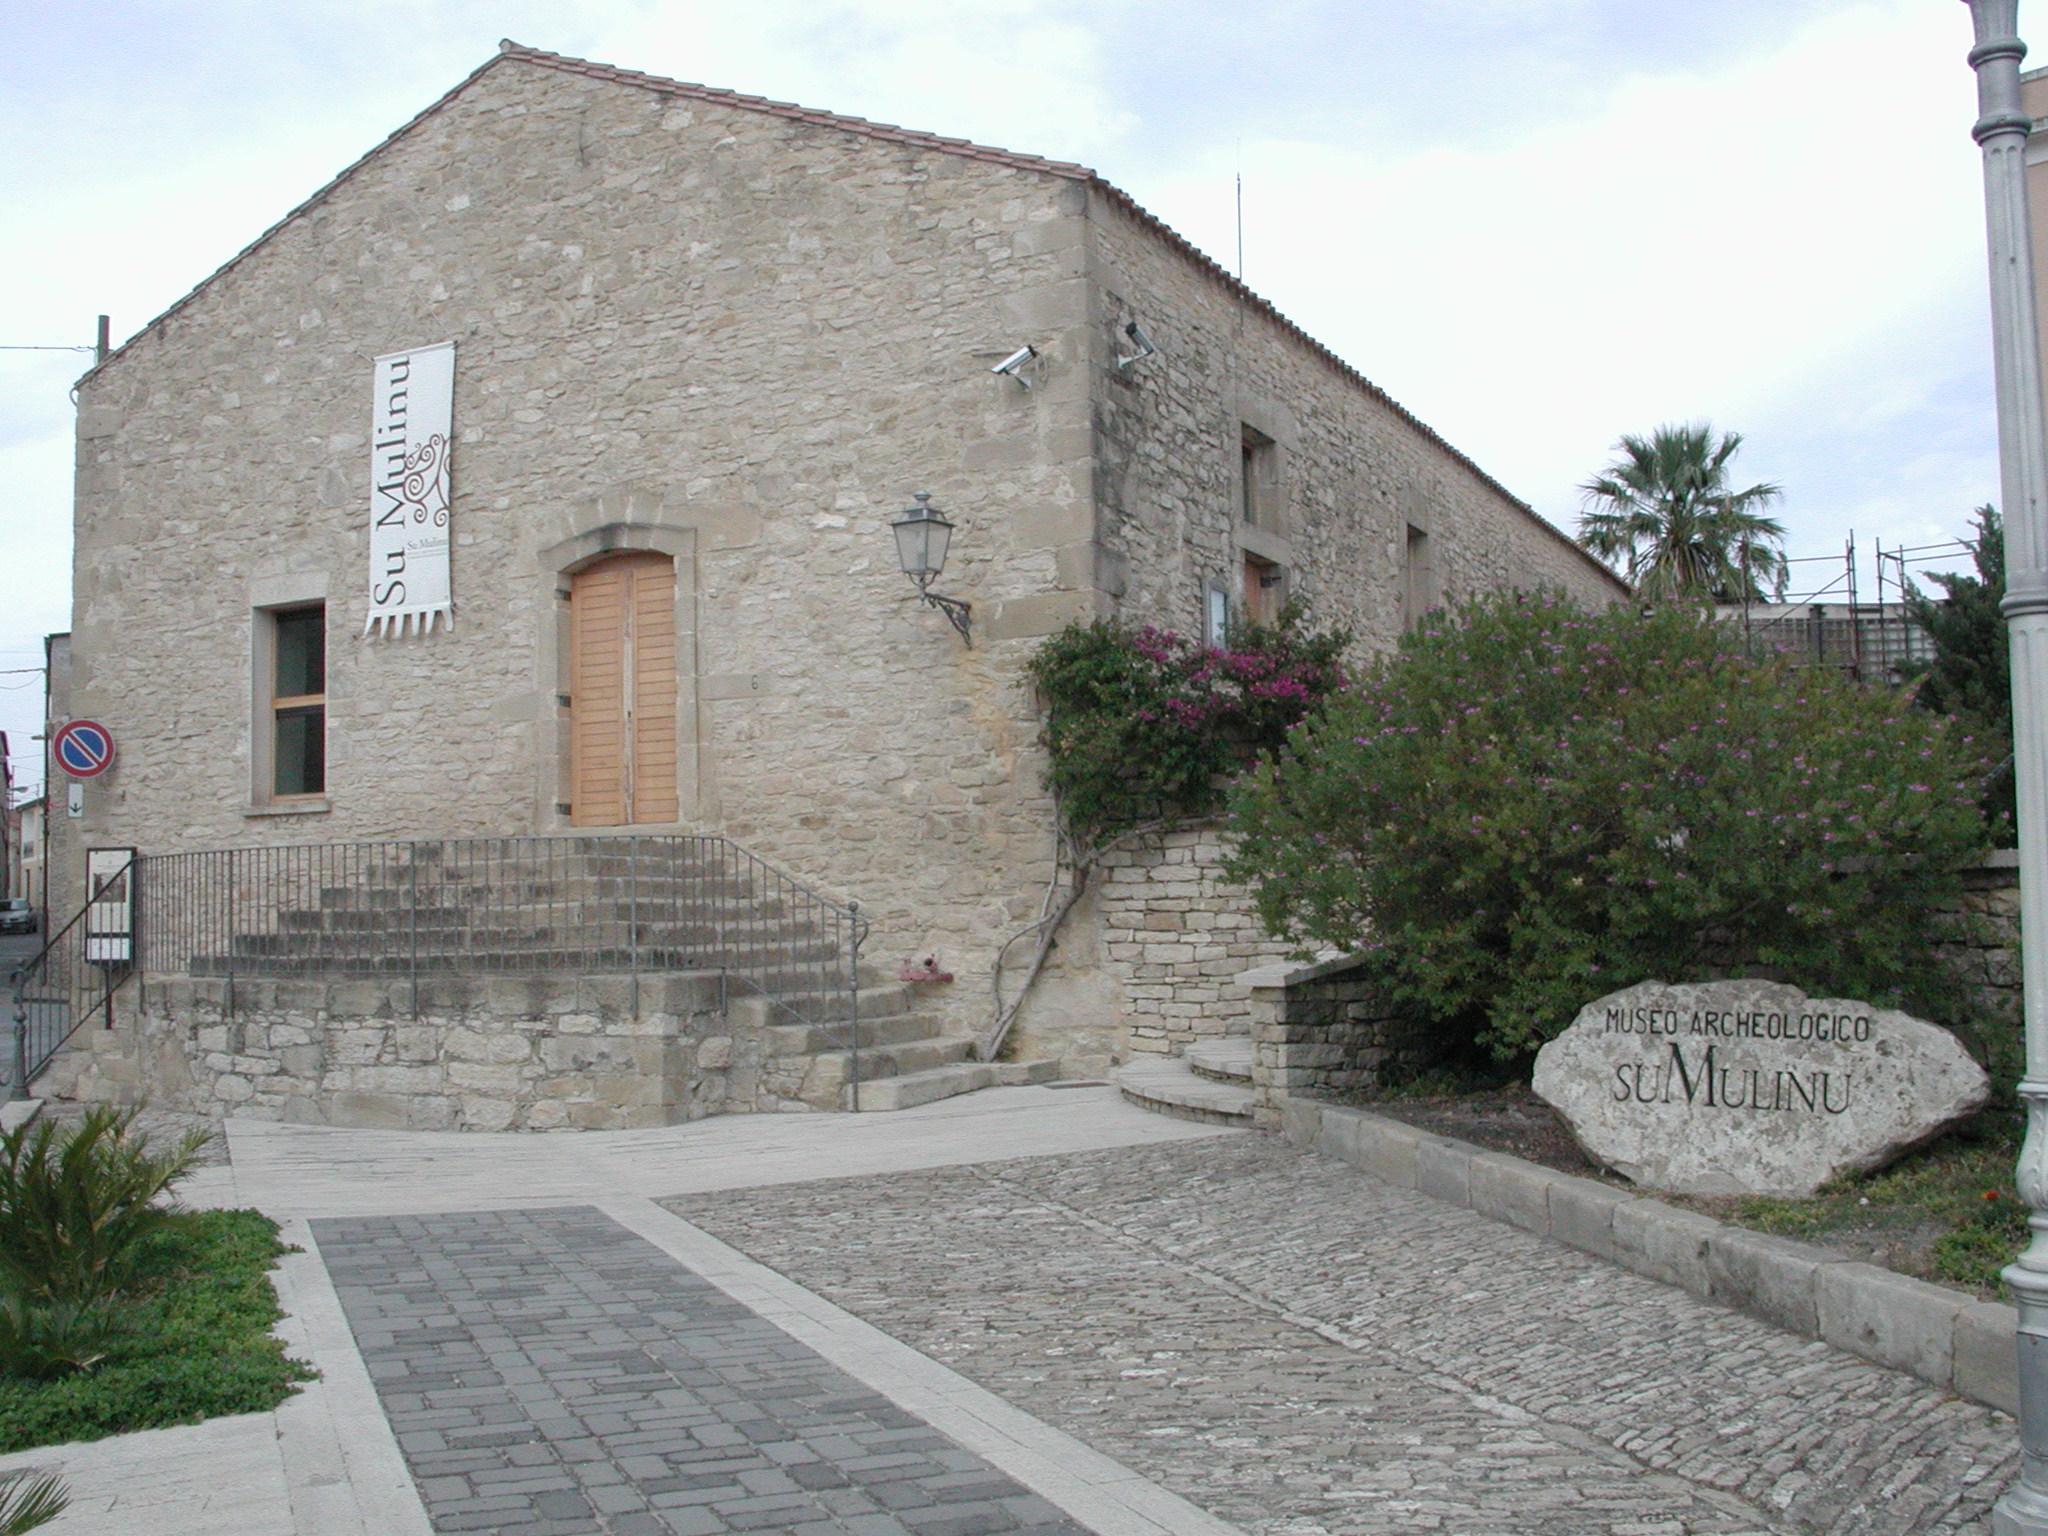 Museo Archeologico Su Mulinu facciata Villanovafranca